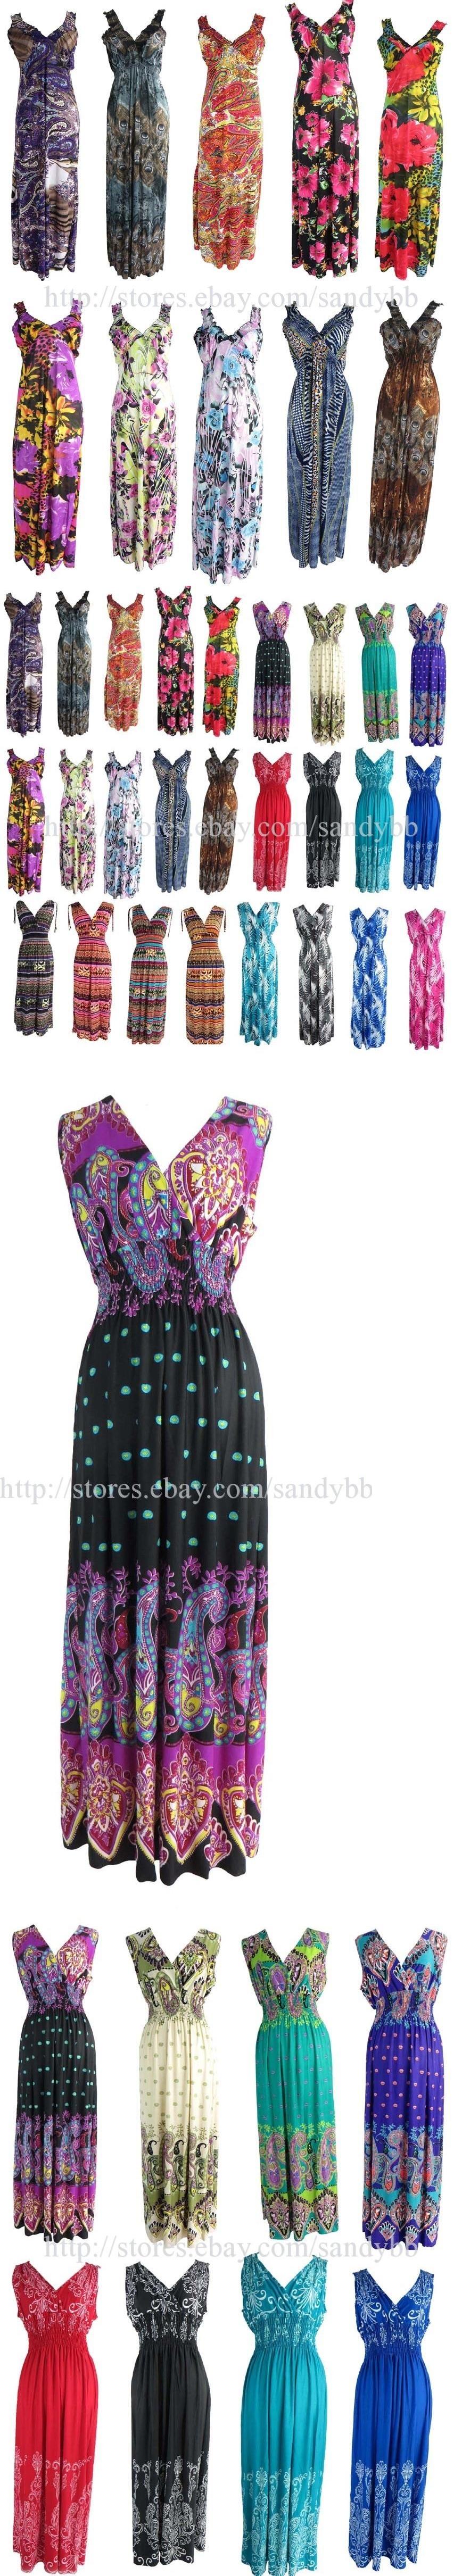 Dresses 50986: $7.5 P Wholesale Lot Of 25 Long Dress Maxi Bohemian Beach Dress -> BUY IT NOW ONLY: $187.5 on eBay!